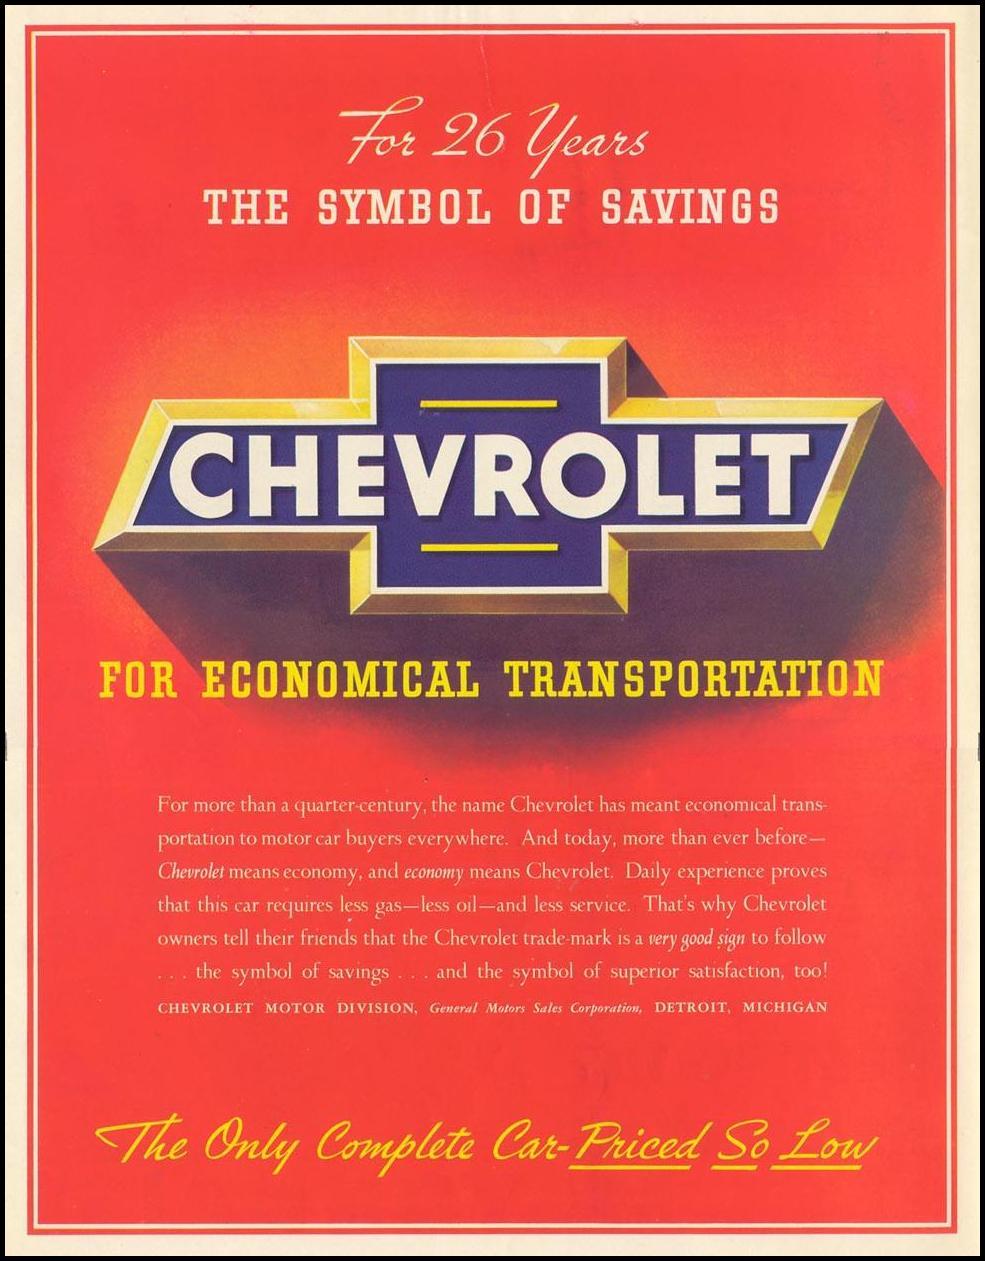 CHEVROLET AUTOMOBILES LIFE 07/26/1937